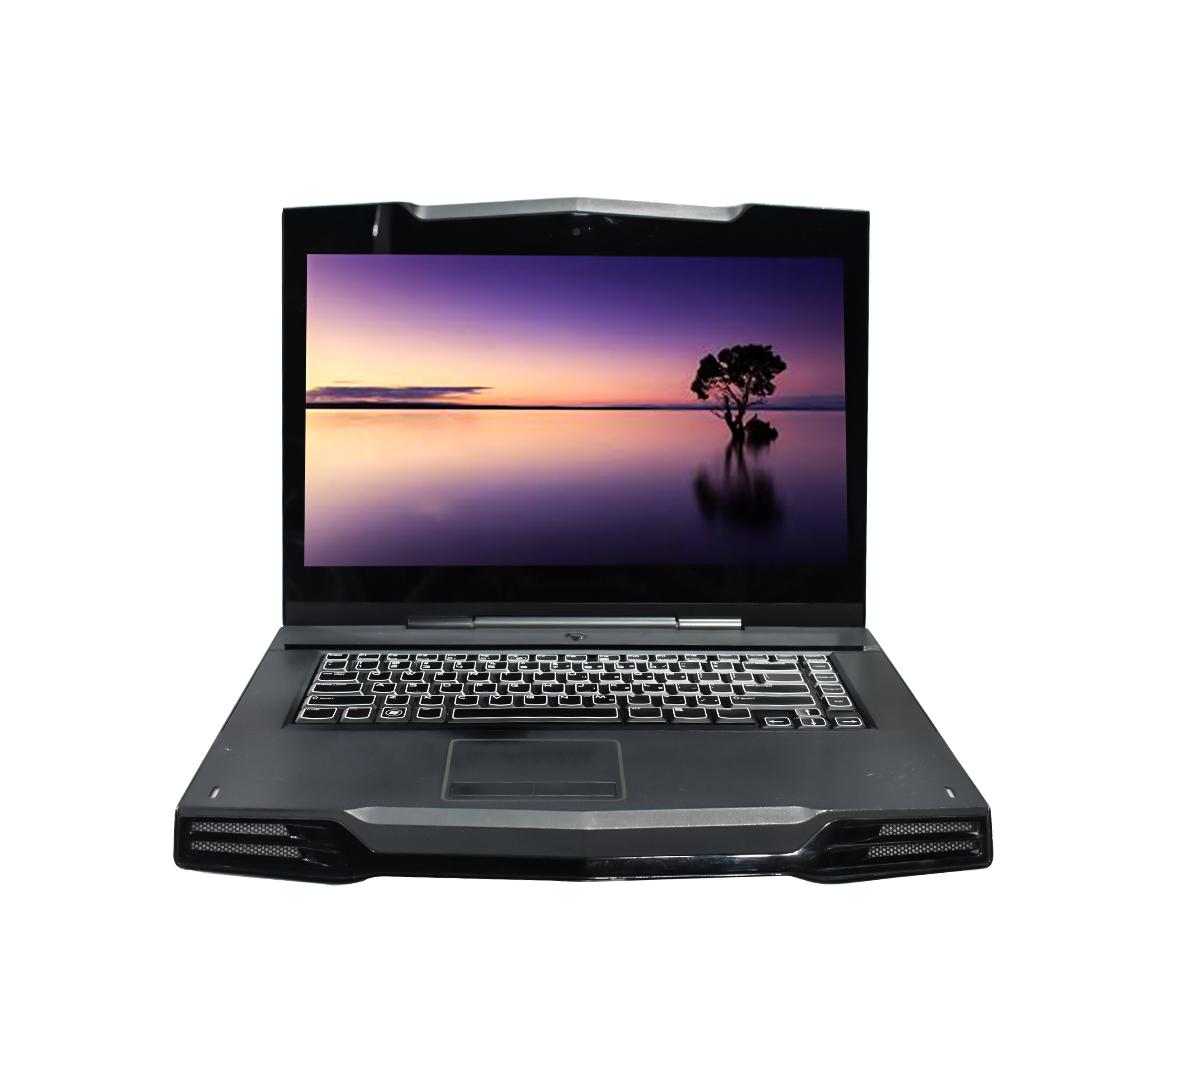 Dell P08G ALIENWARE Gaming Laptop, Intel Core i3-M330 CPU, 8GB DDR3 SODIMM RAM, 1TB SATA 2.5 Hard, 15 inch Display, Windows 10 pro (Refurbished)